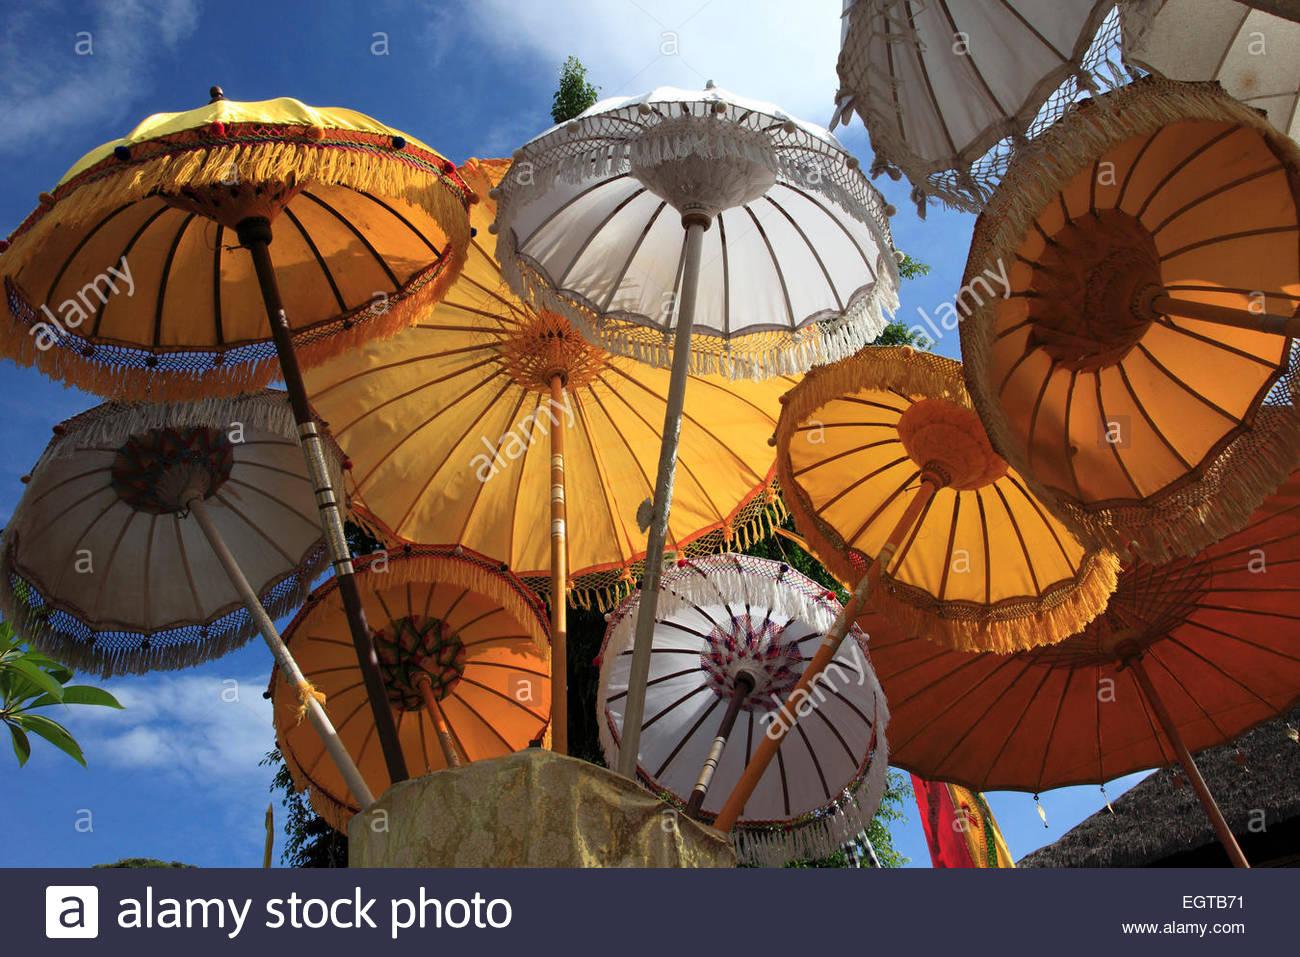 Indonesia, Bali, Mas, temple festival, umbrellas, odalan, Kuningan holiday, - Stock Image